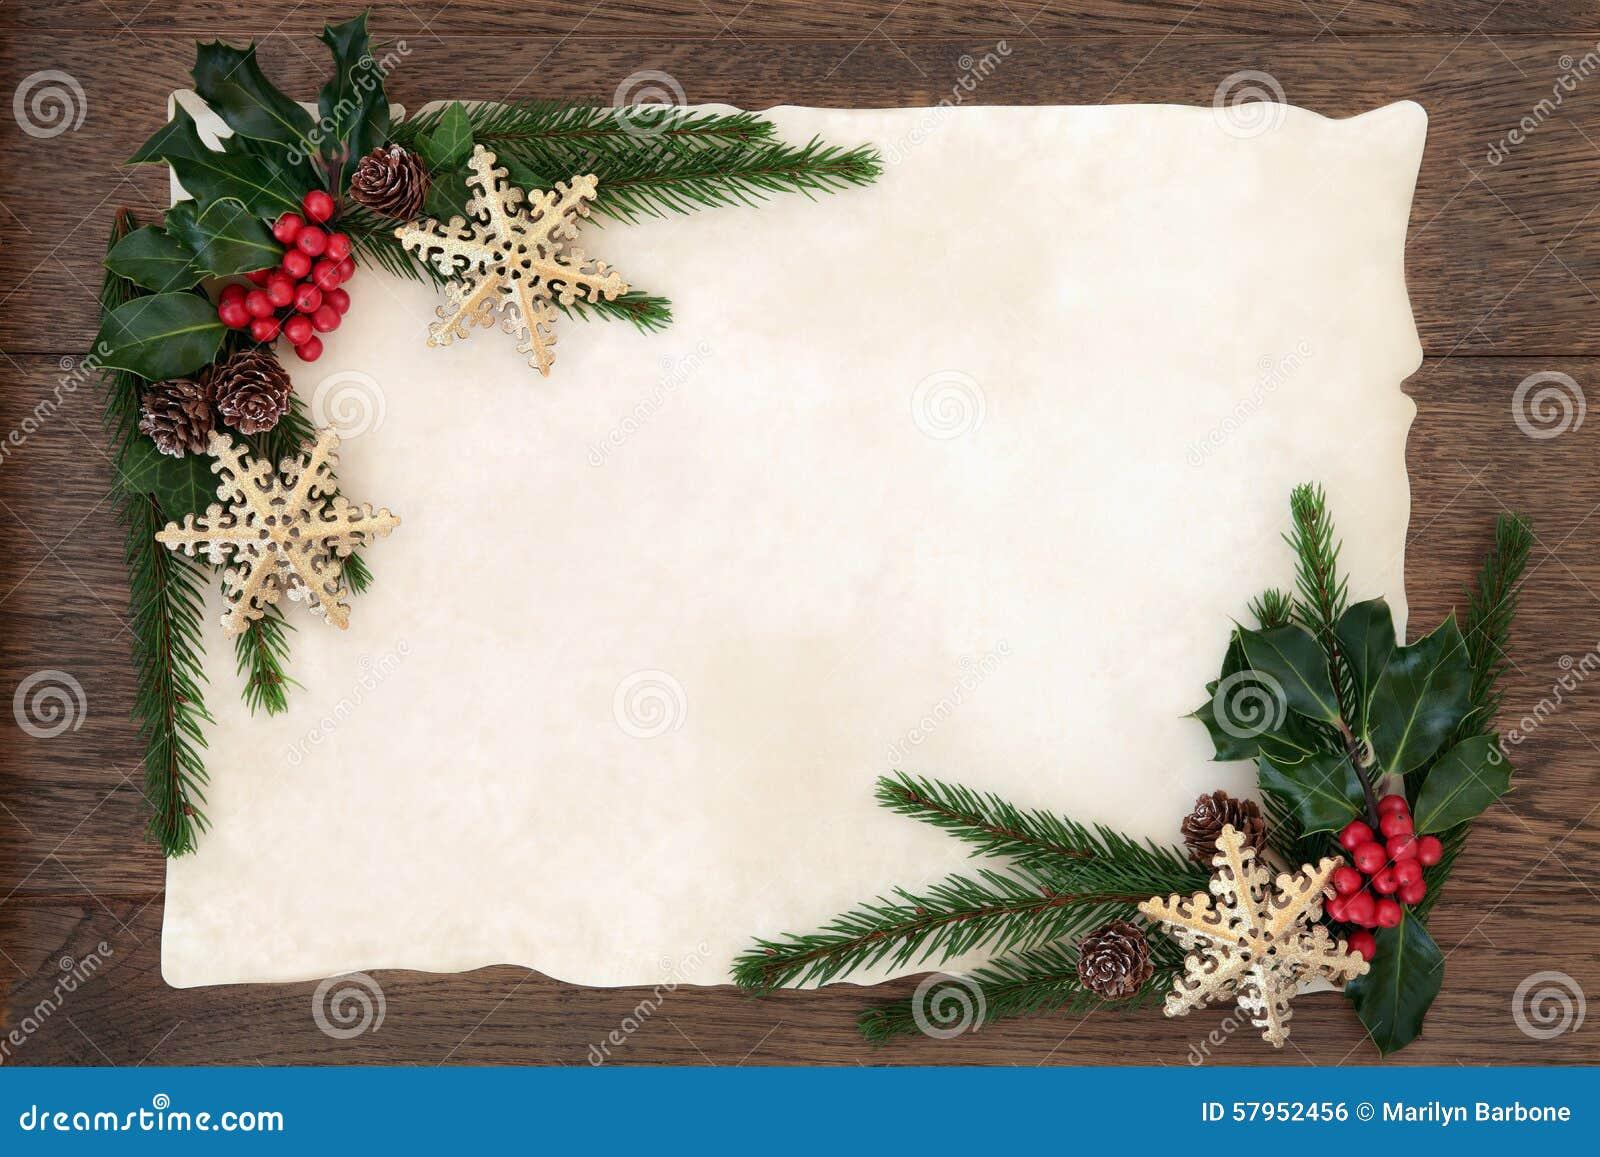 Fir Cone Christmas Decorations